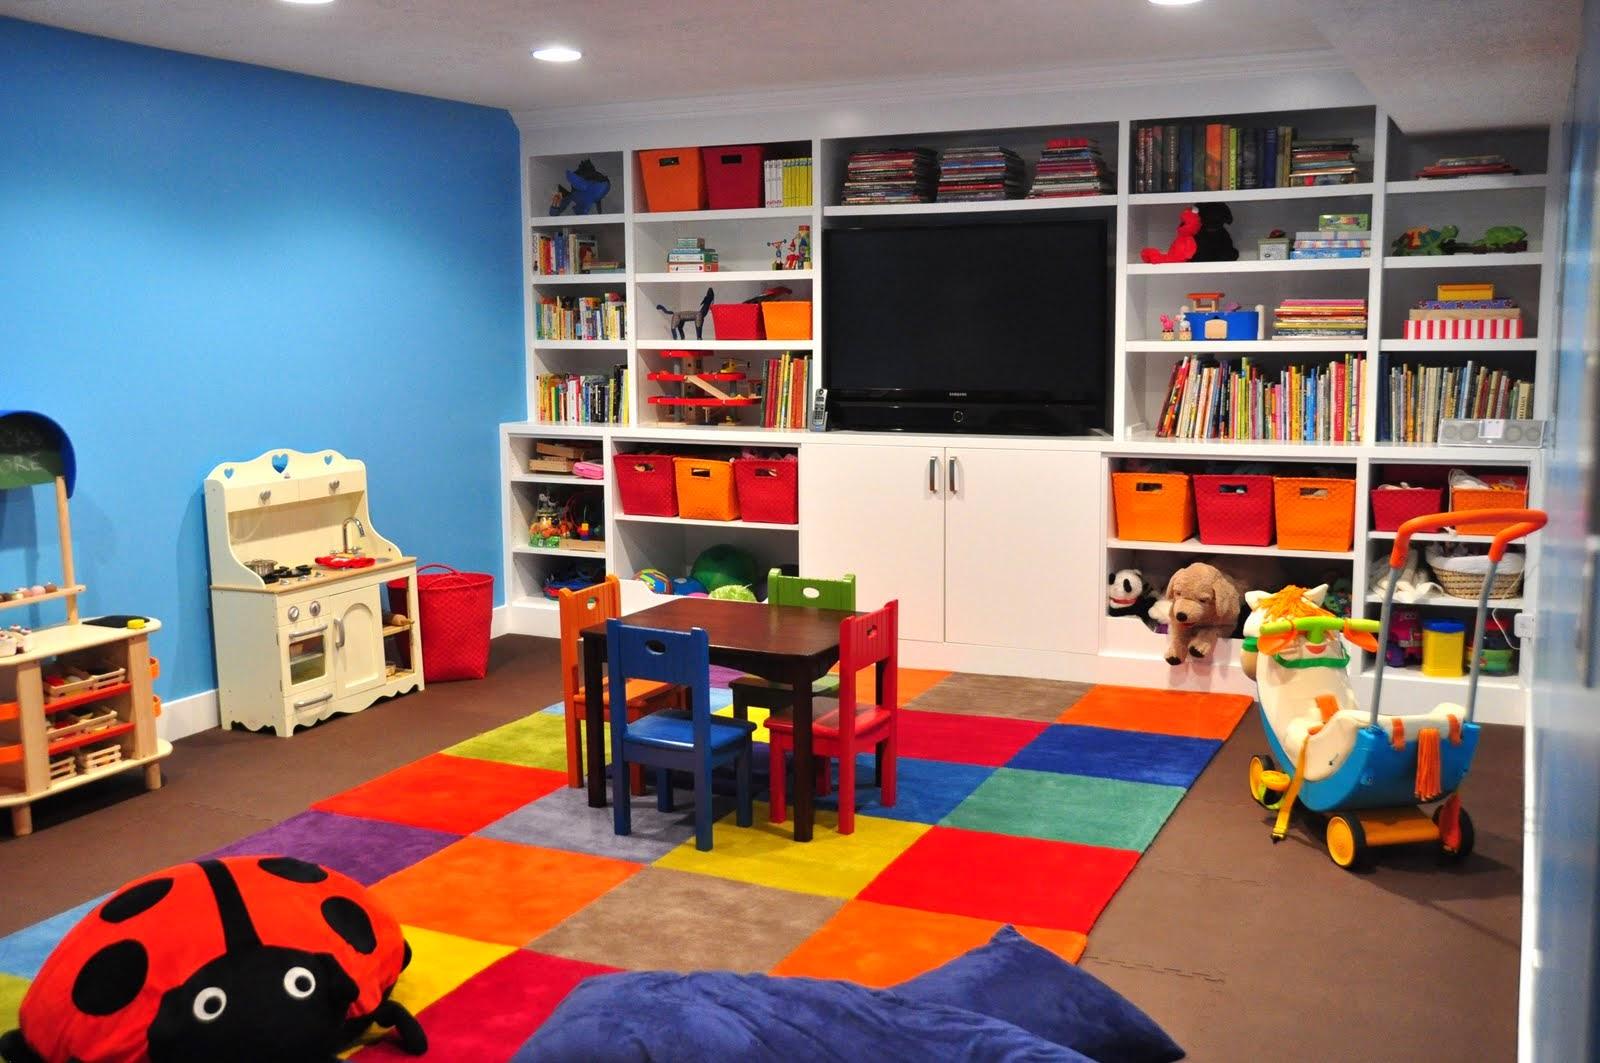 Kumpulan Gambar Kamar Bermain Anak Desain Interior Ruangan Minimalis